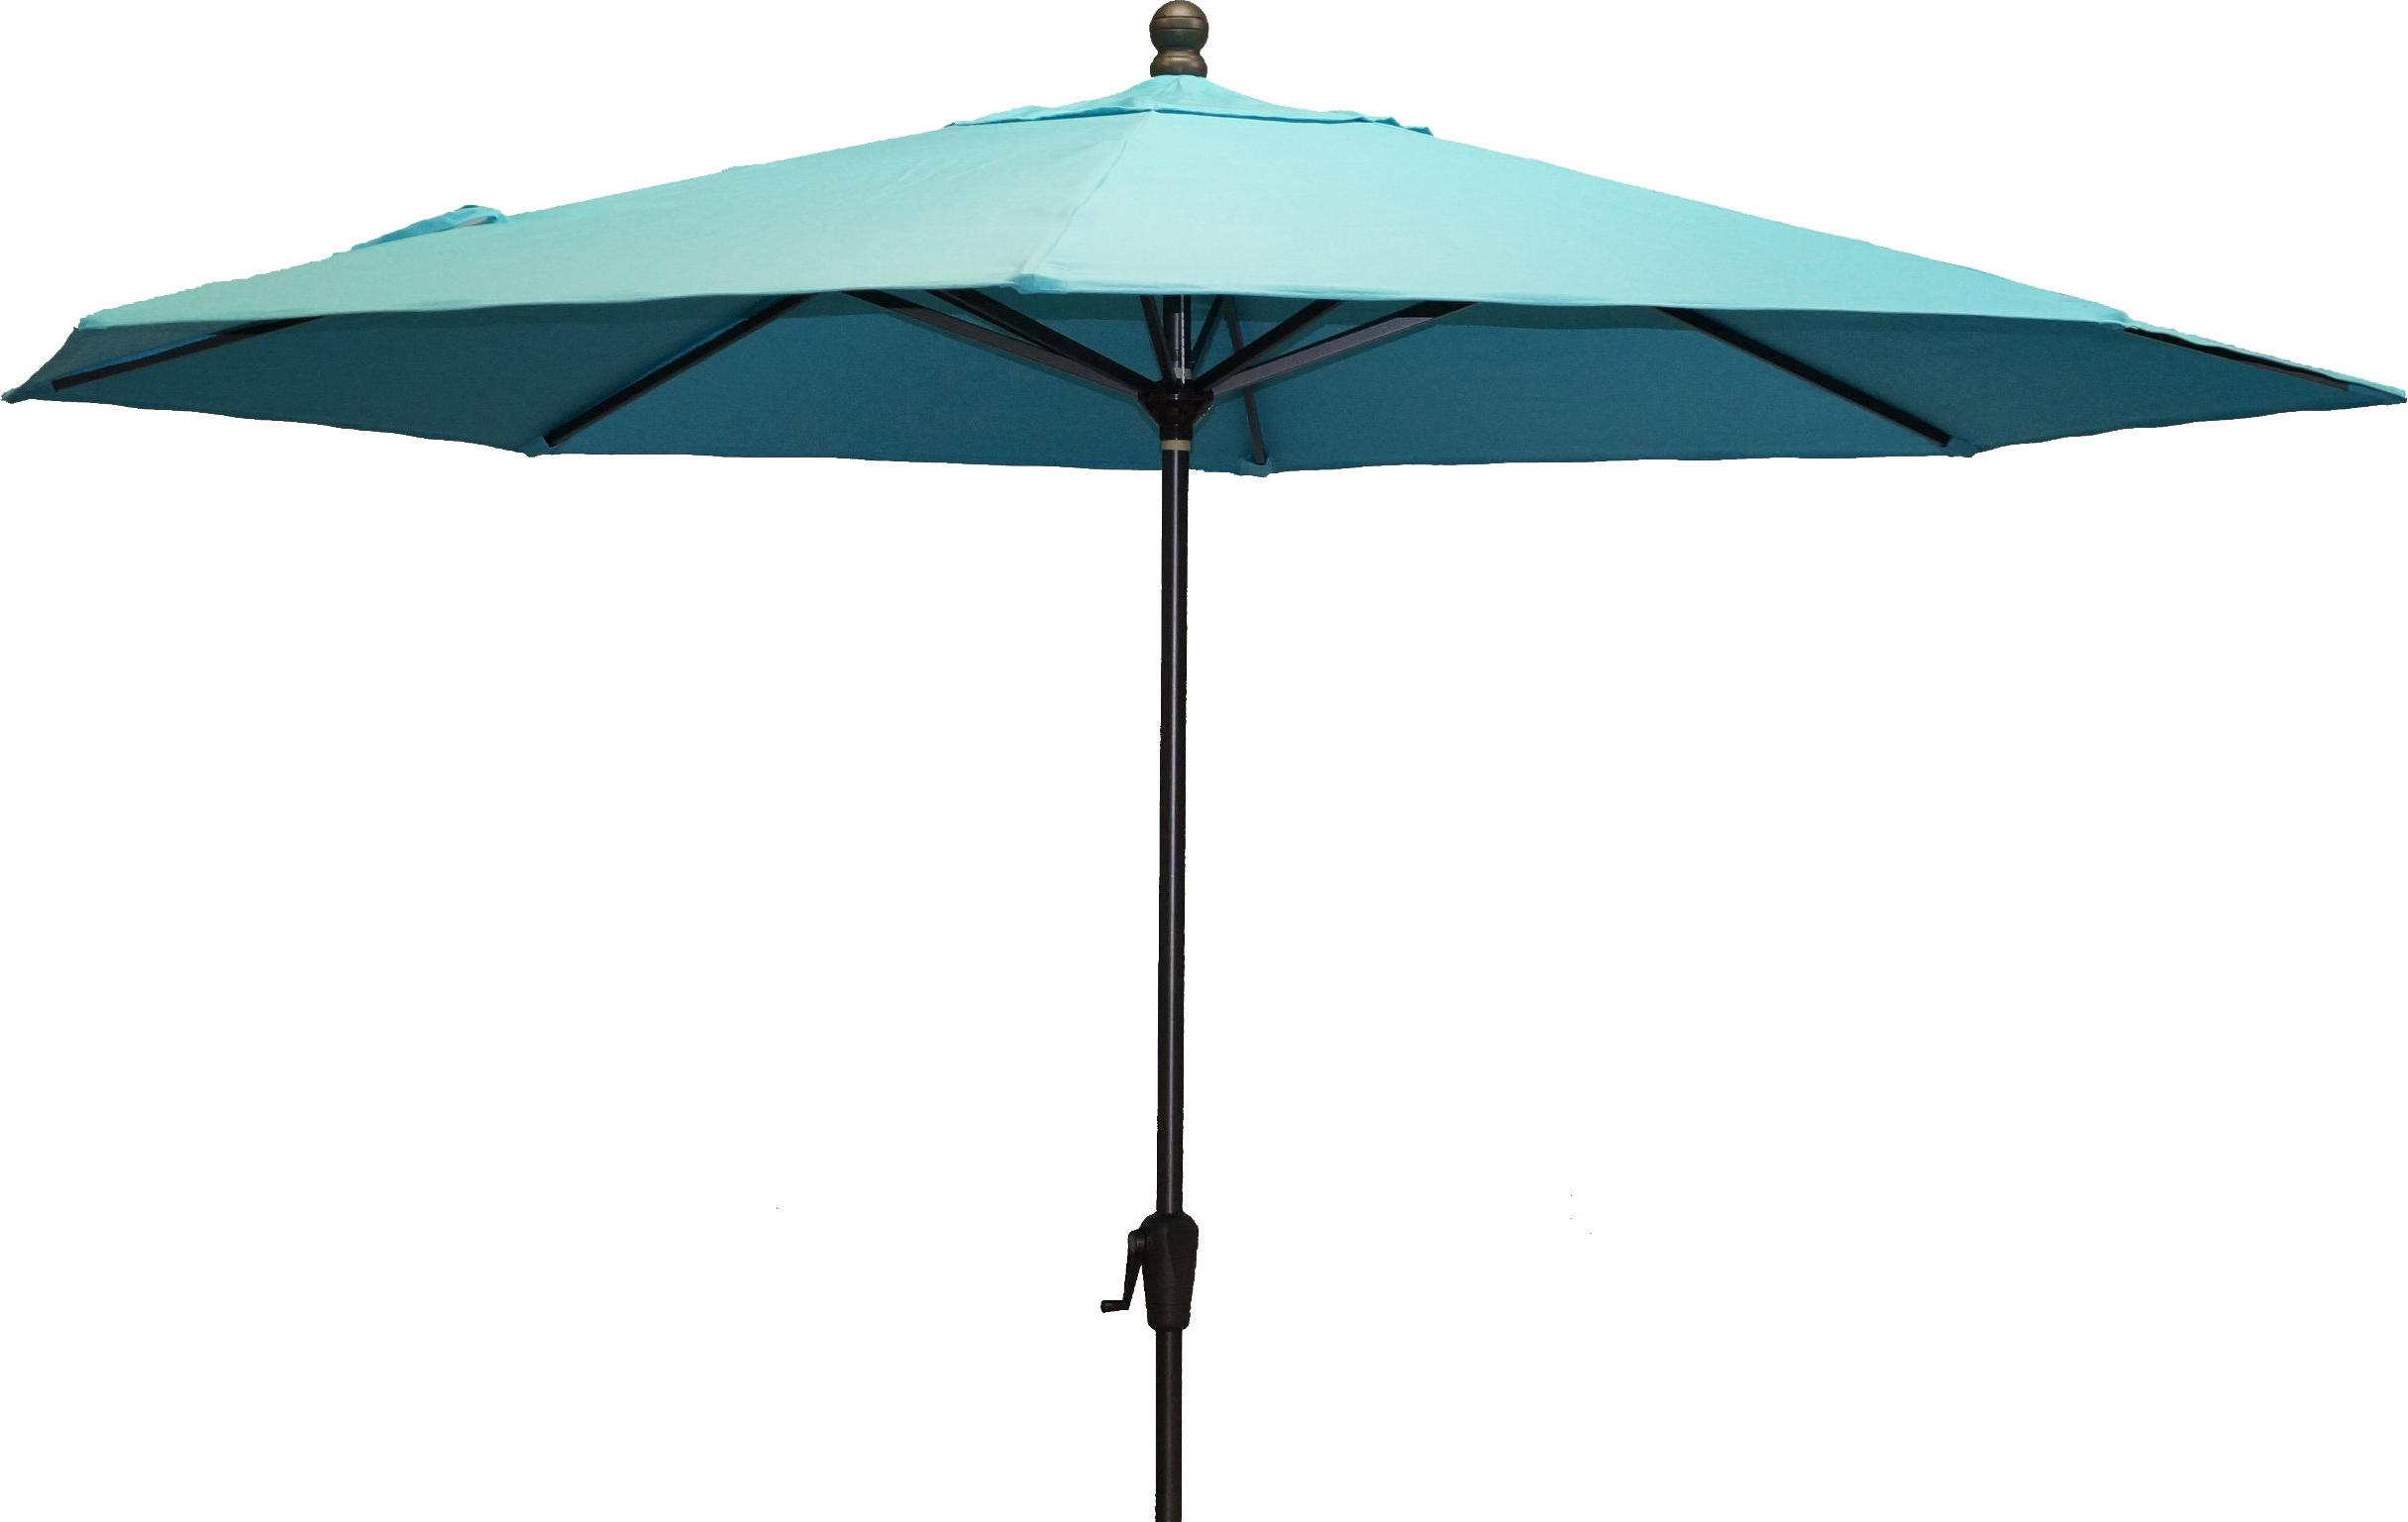 Best And Newest Keegan Market Umbrellas Regarding Melanie 11' Market Sunbrella Umbrella (View 2 of 20)